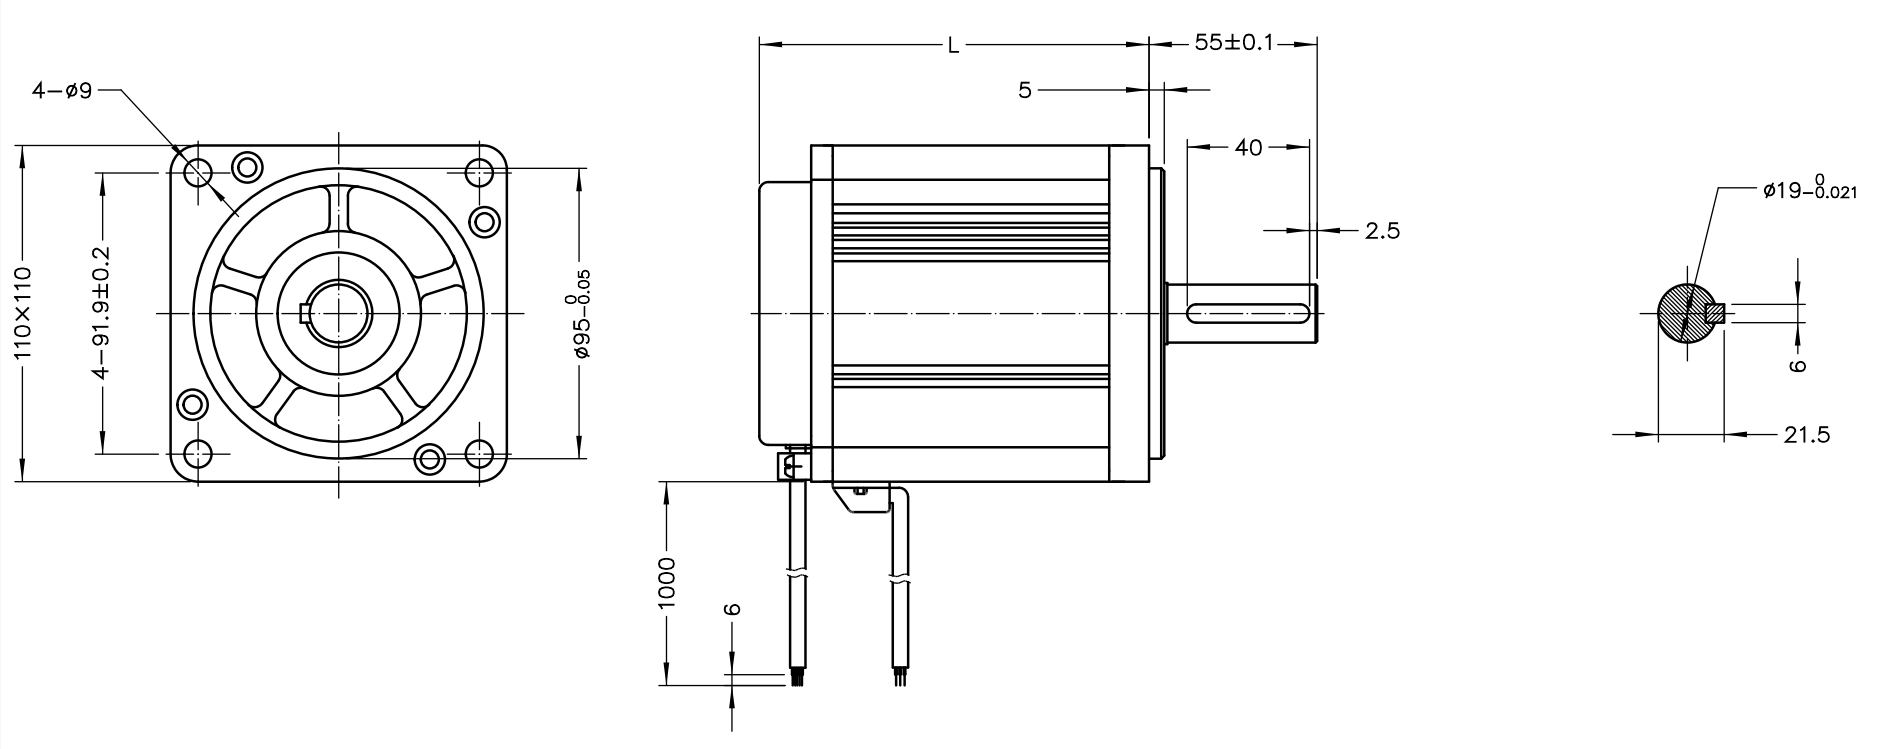 NEMA 43 BLDC Motor Drawing